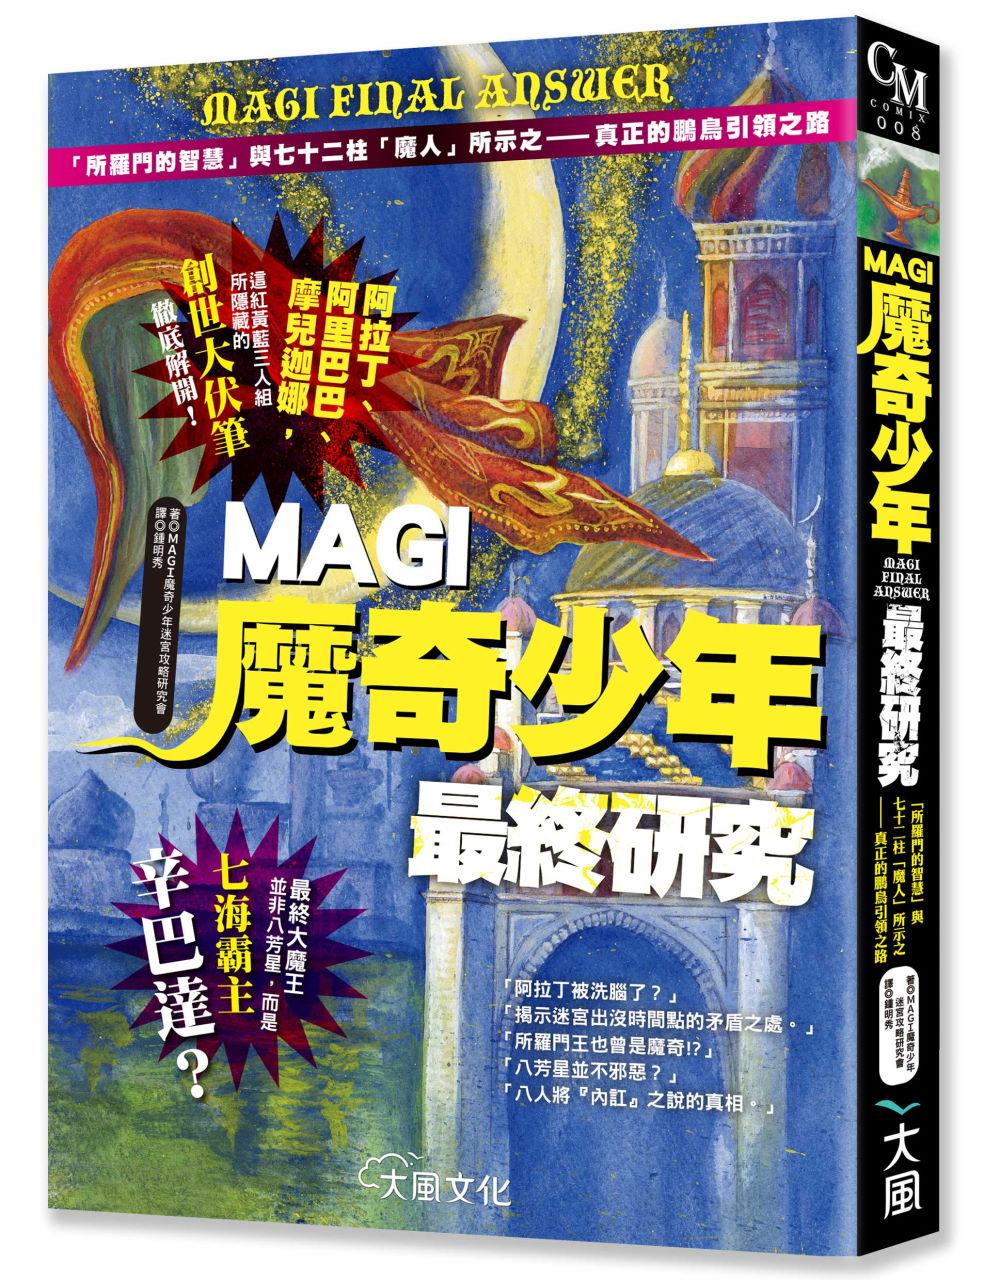 MAGI魔奇少年最終研究 「所羅門的智慧」與七十二柱「魔人」所示之──真正的鵬鳥引領之路